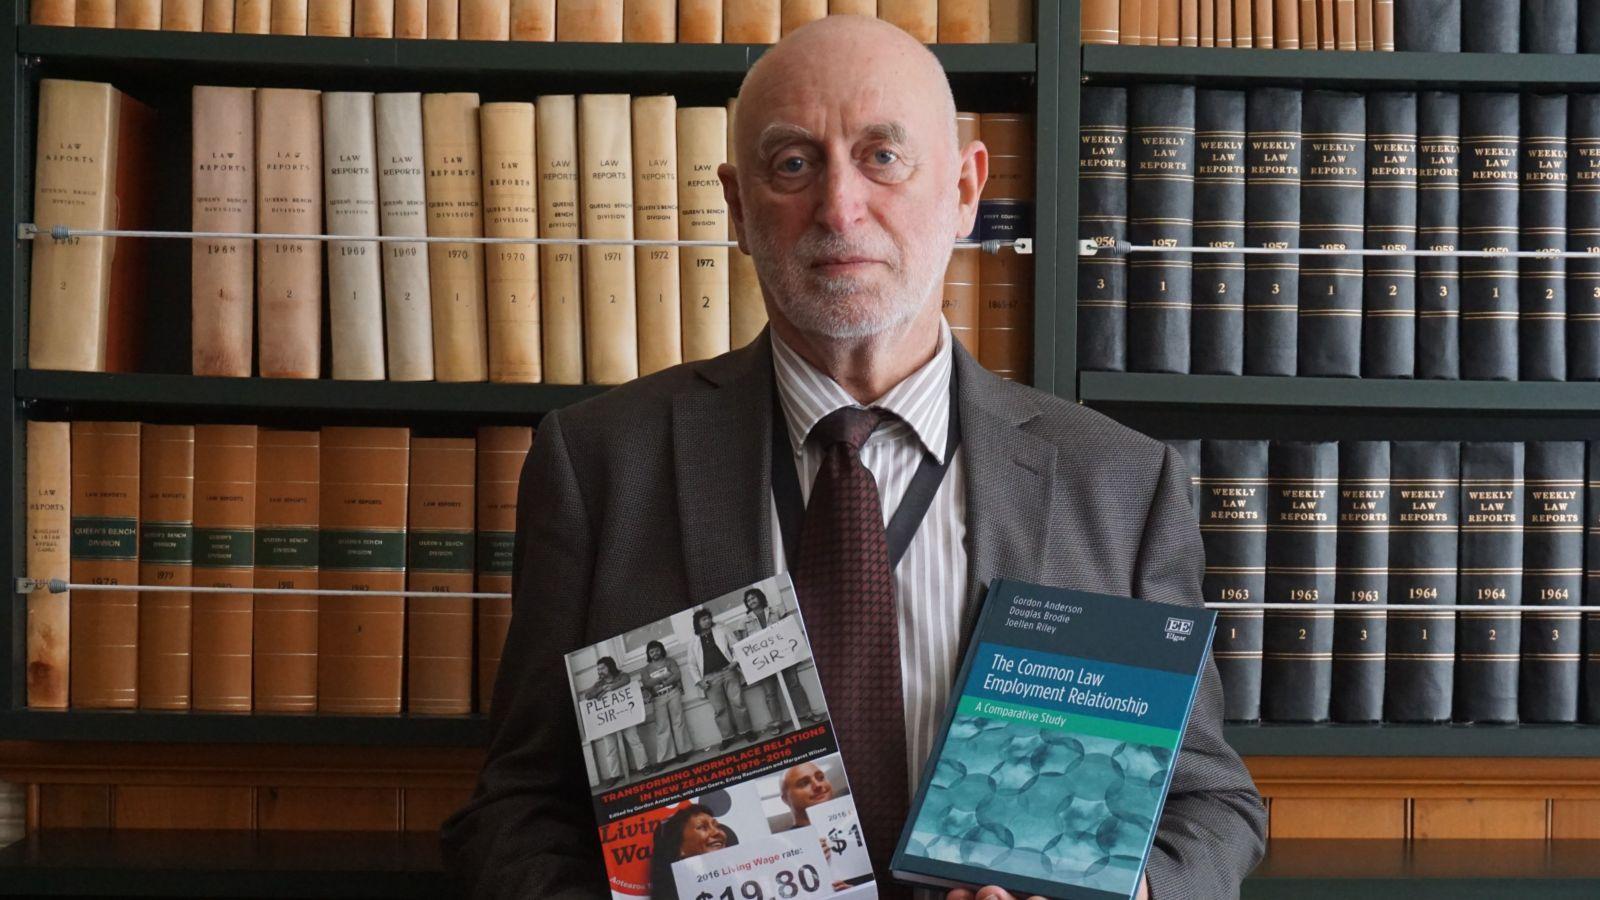 Professor Gordon Anderson with copies of his 2017 publications